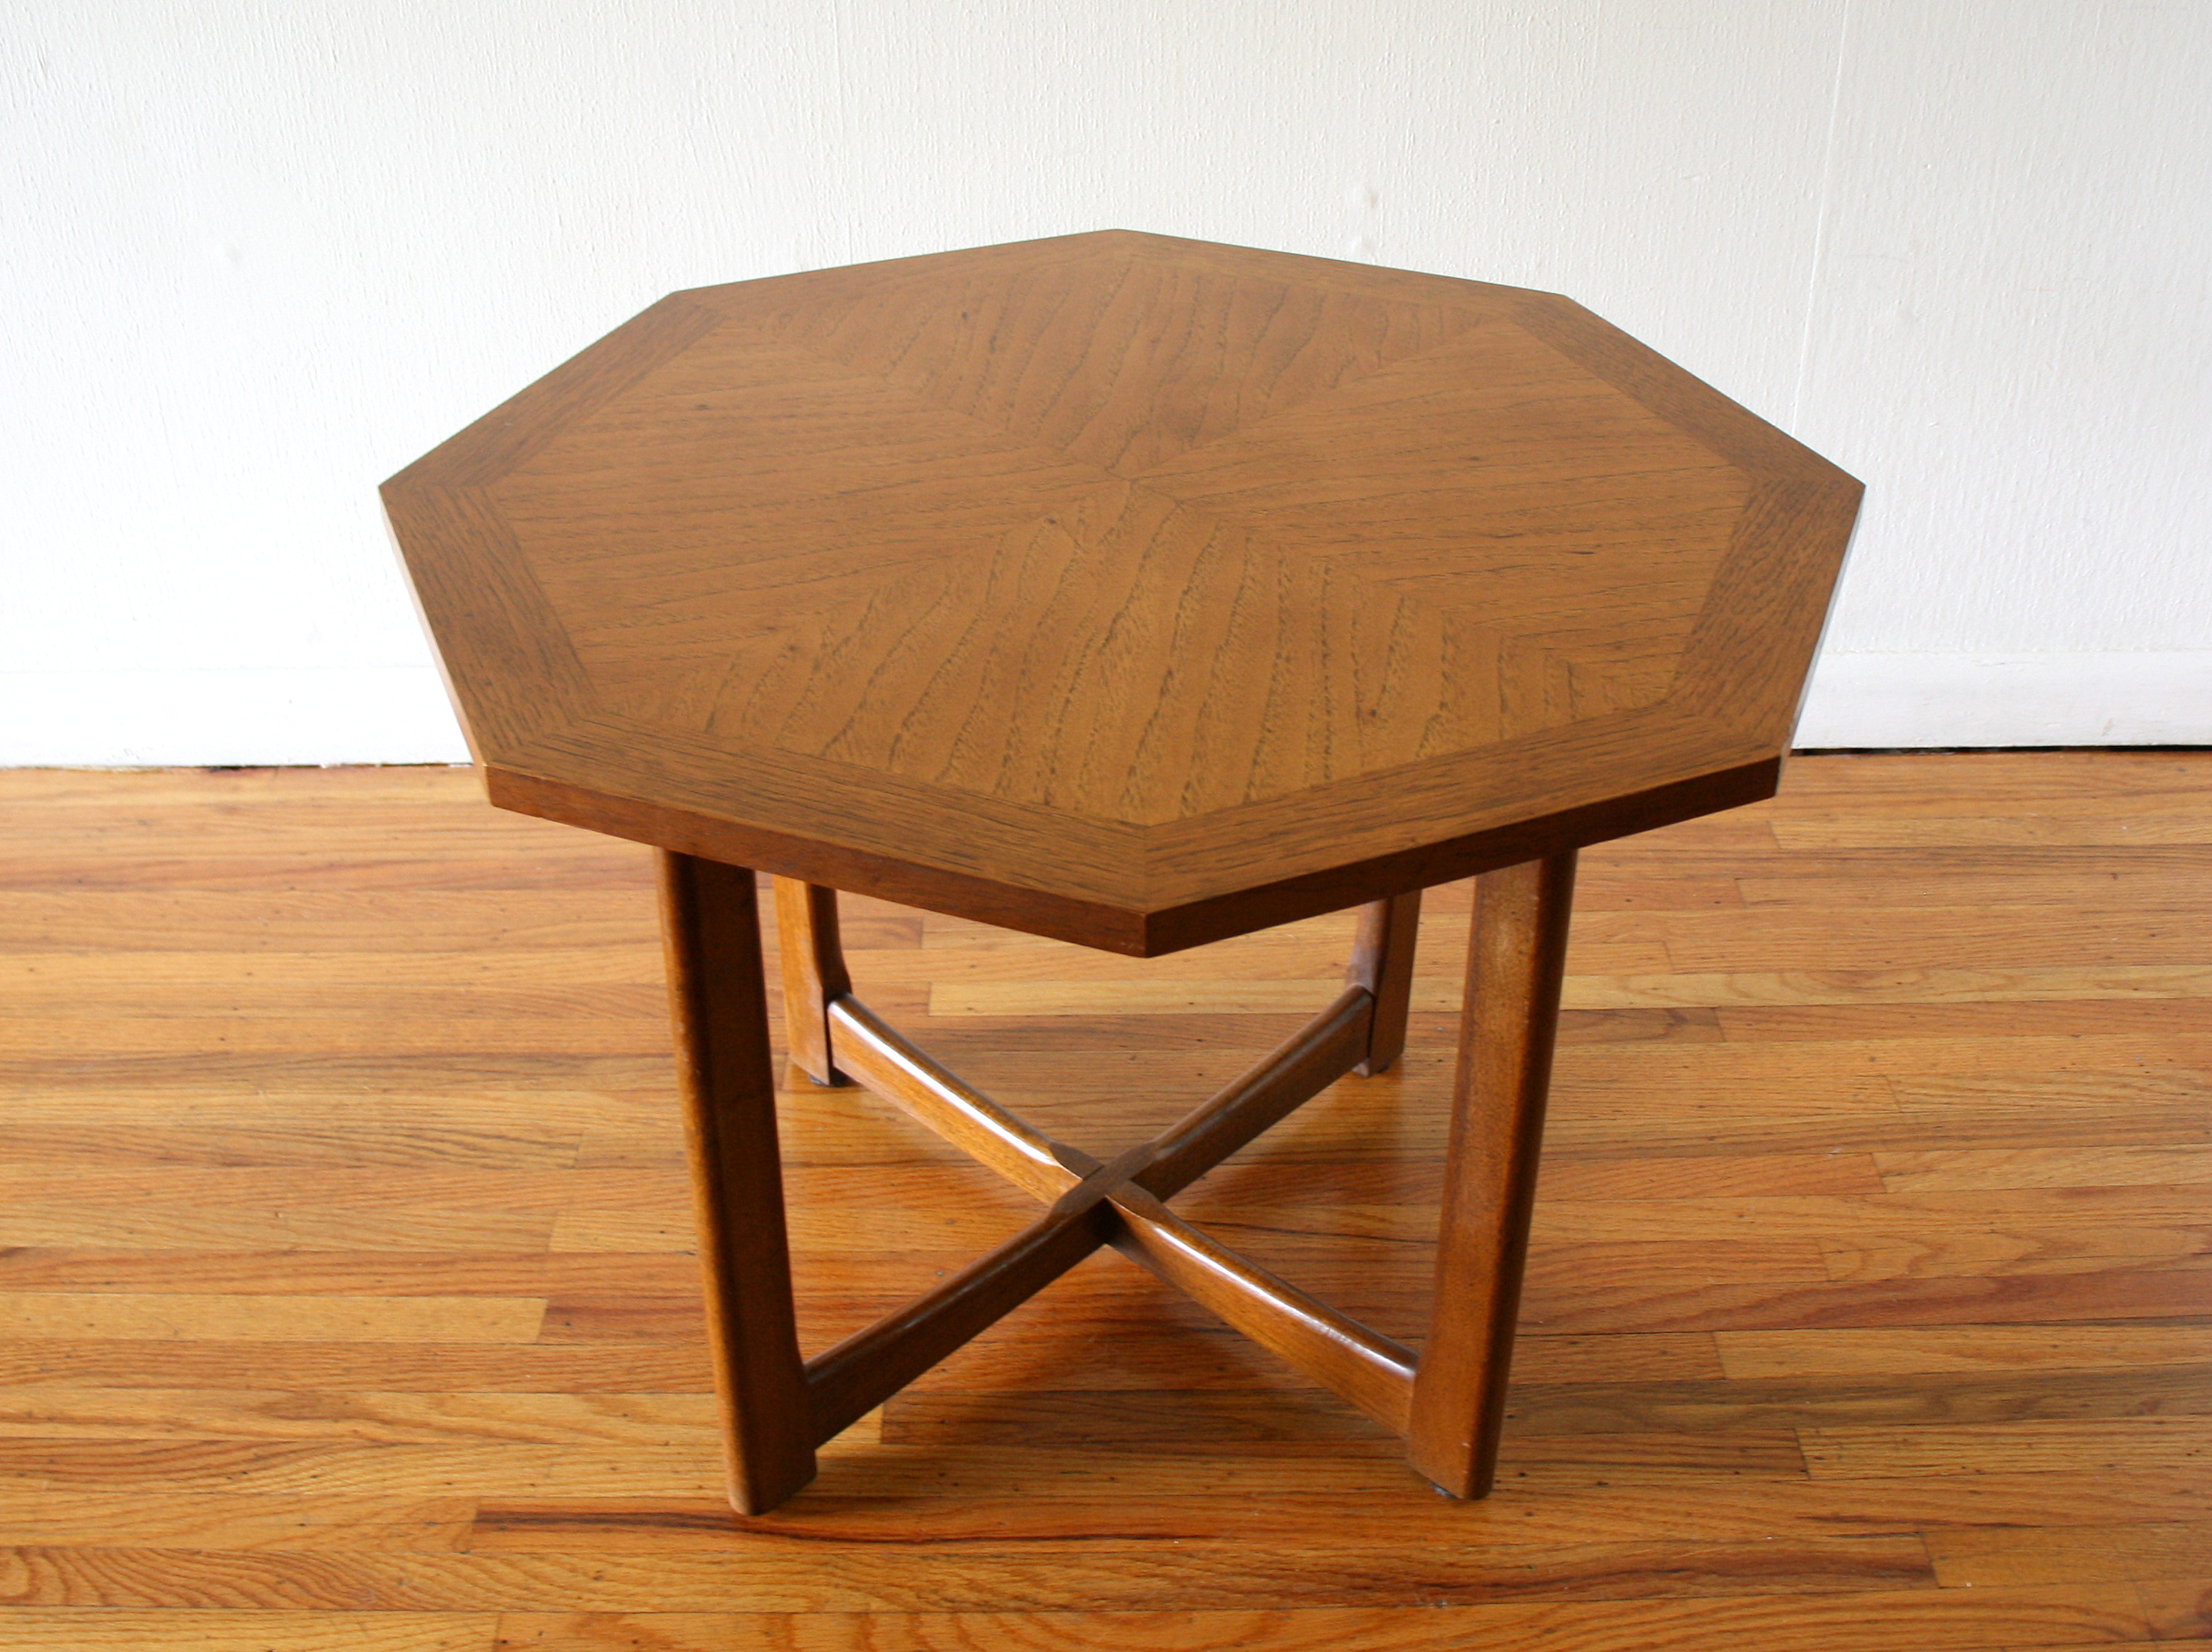 Mcm sunburst table with cross base 2